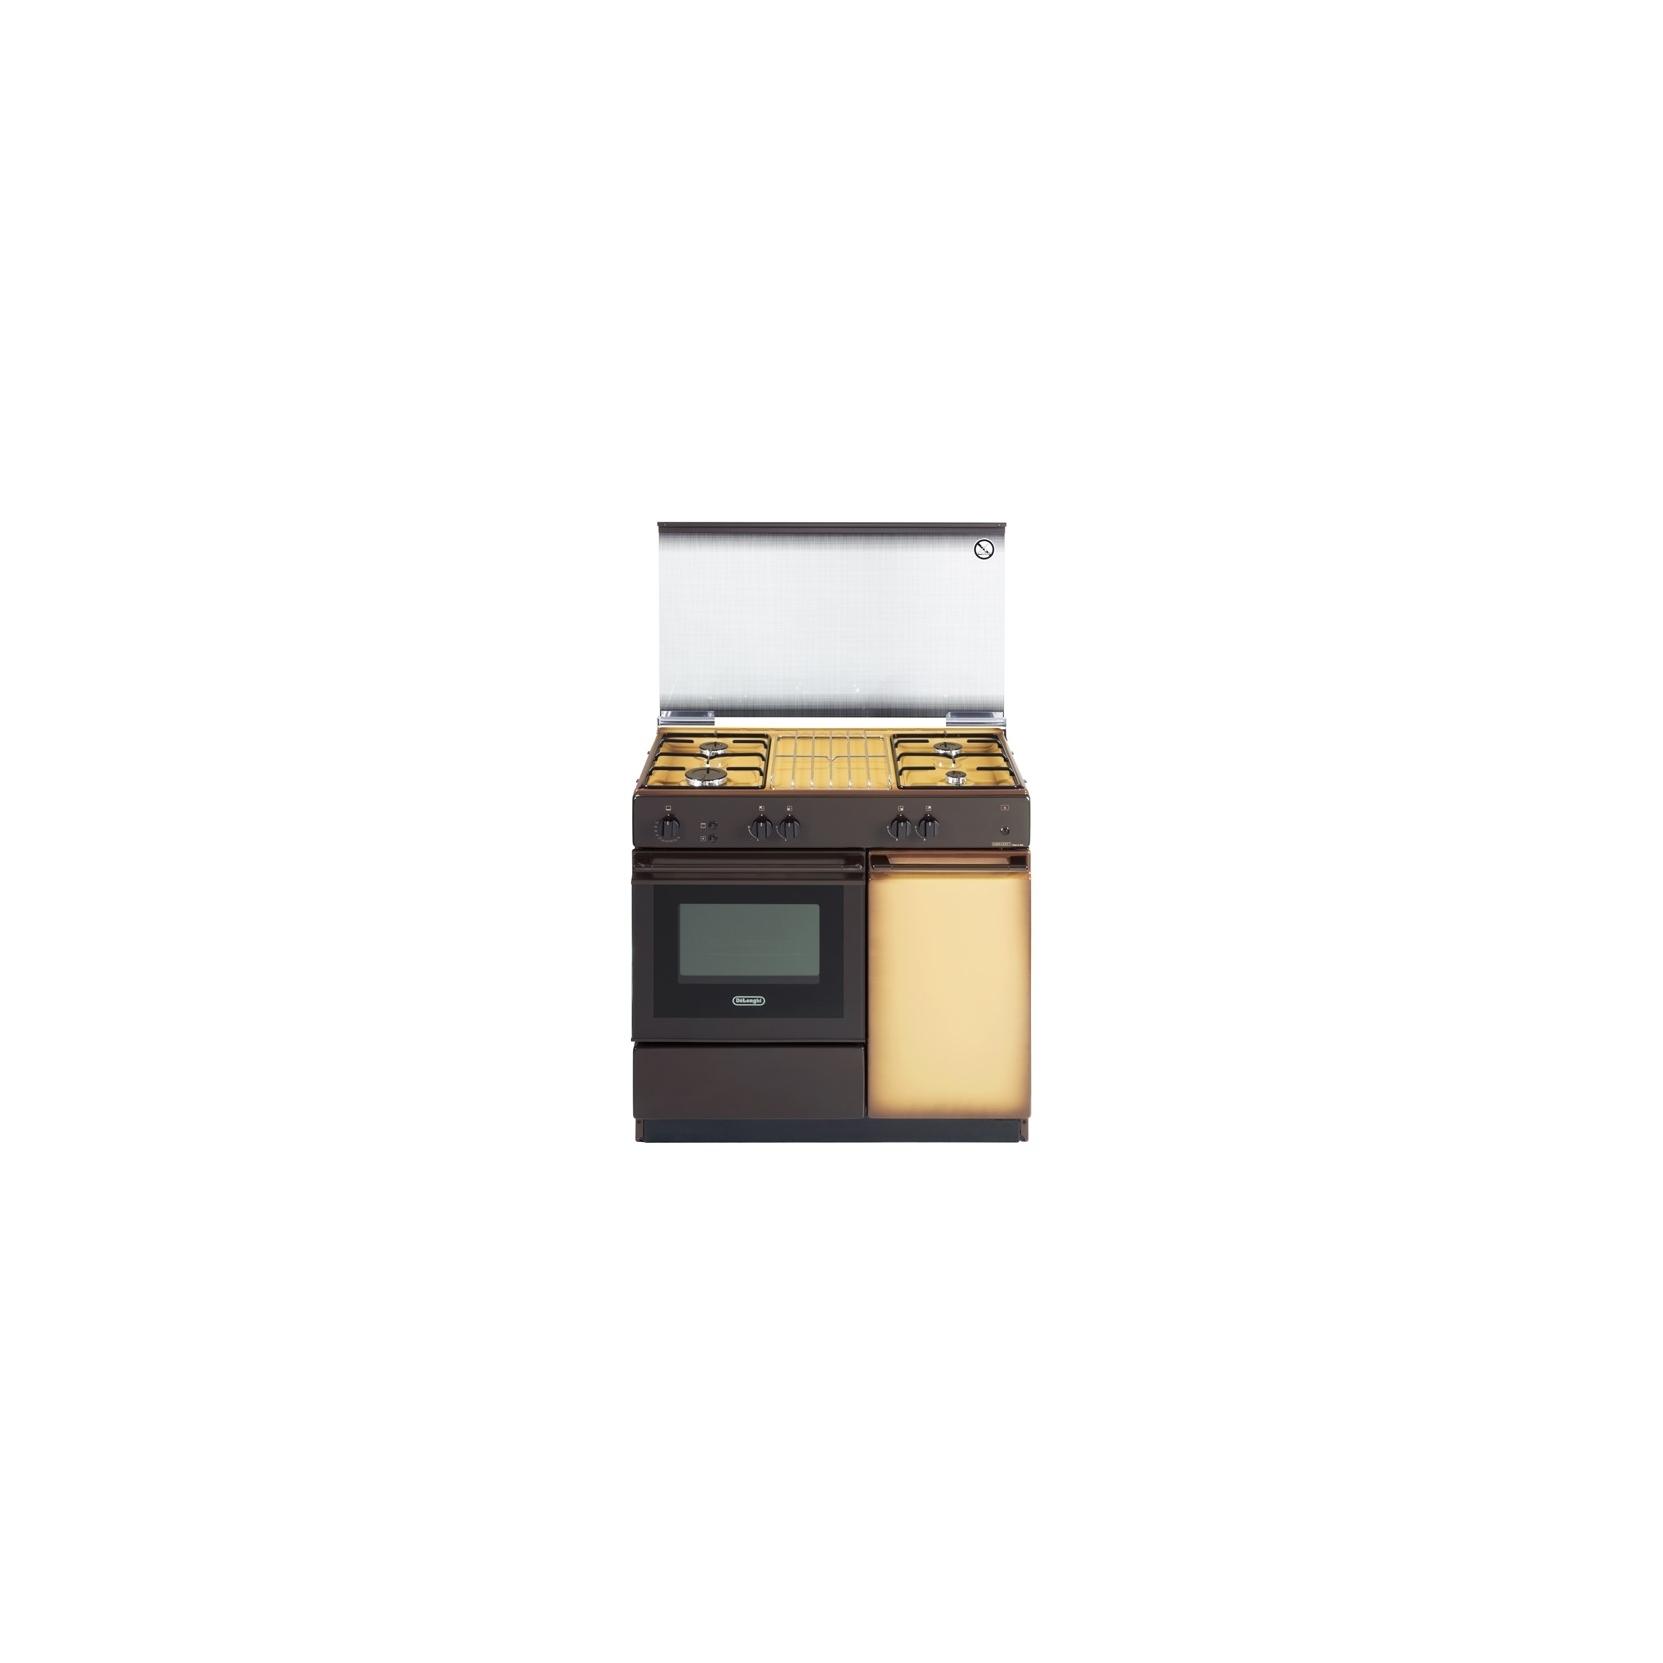 Cucina de longhi sggk854n marrone 4 fuochi a gas 86x50 forno a gas con grill elettrico - Cucina elettrica de longhi ...